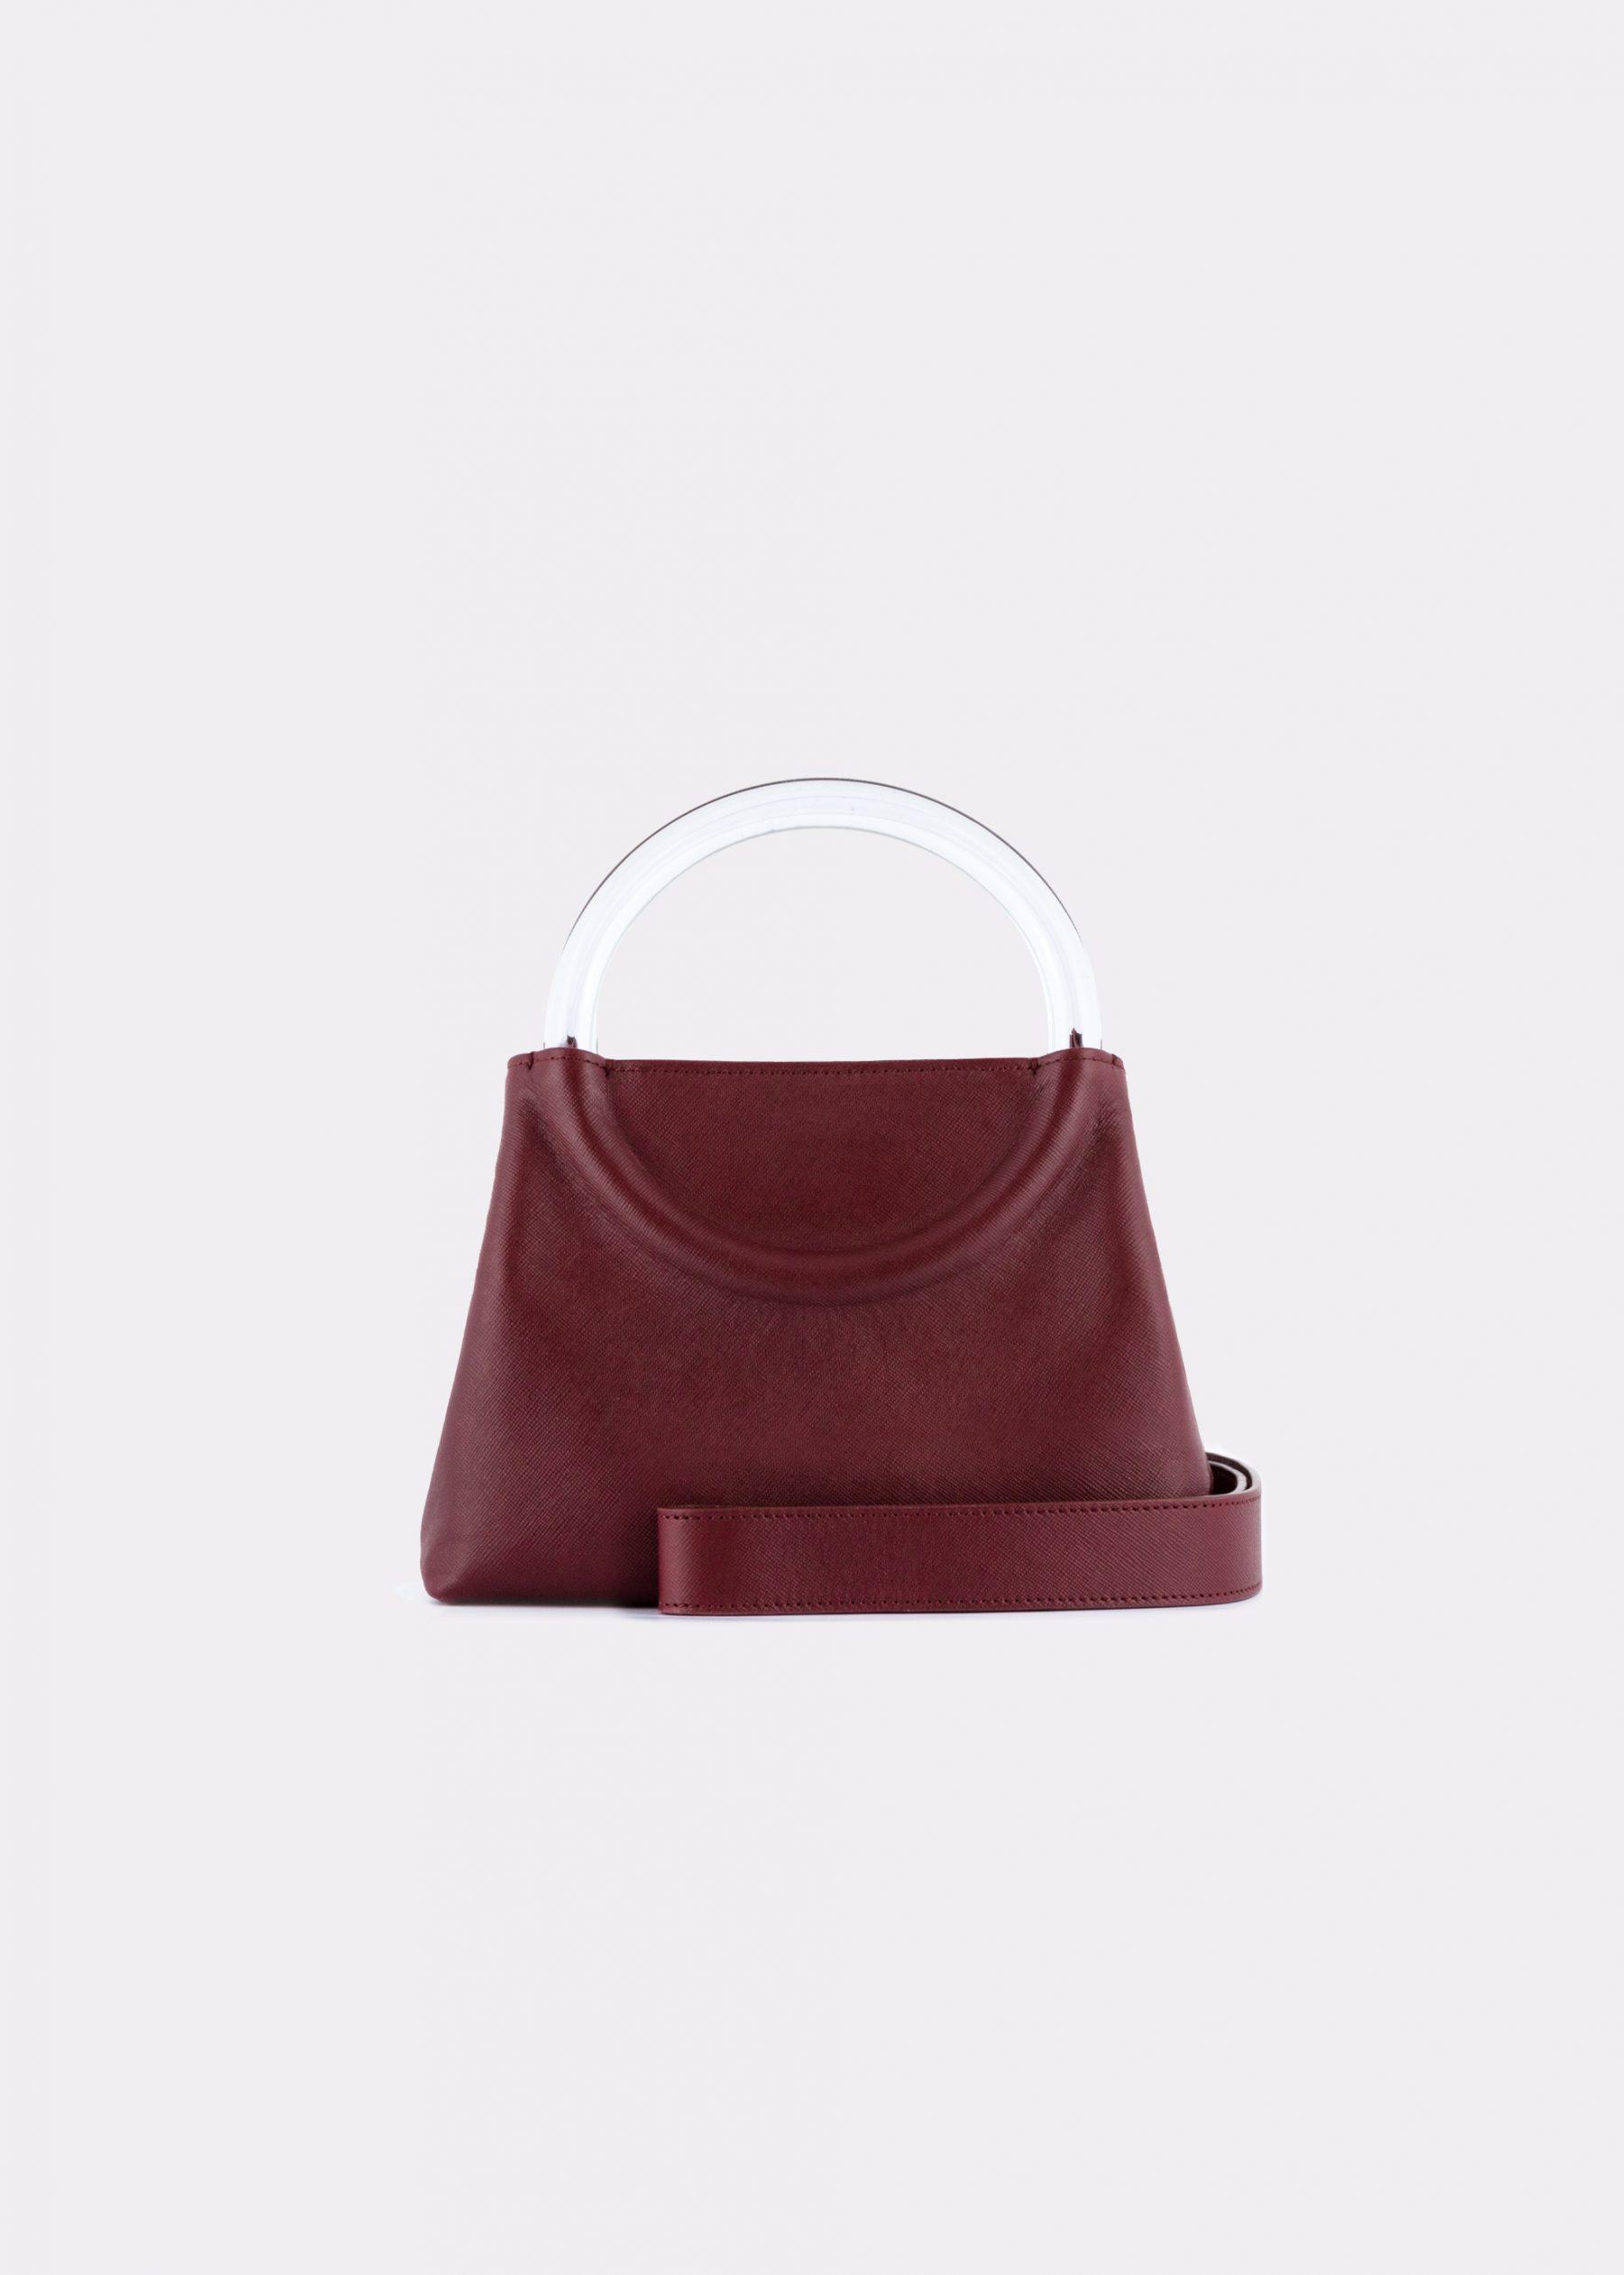 NIDO-Bolla_Mini-bag-bordeaux_shoulderstrap view